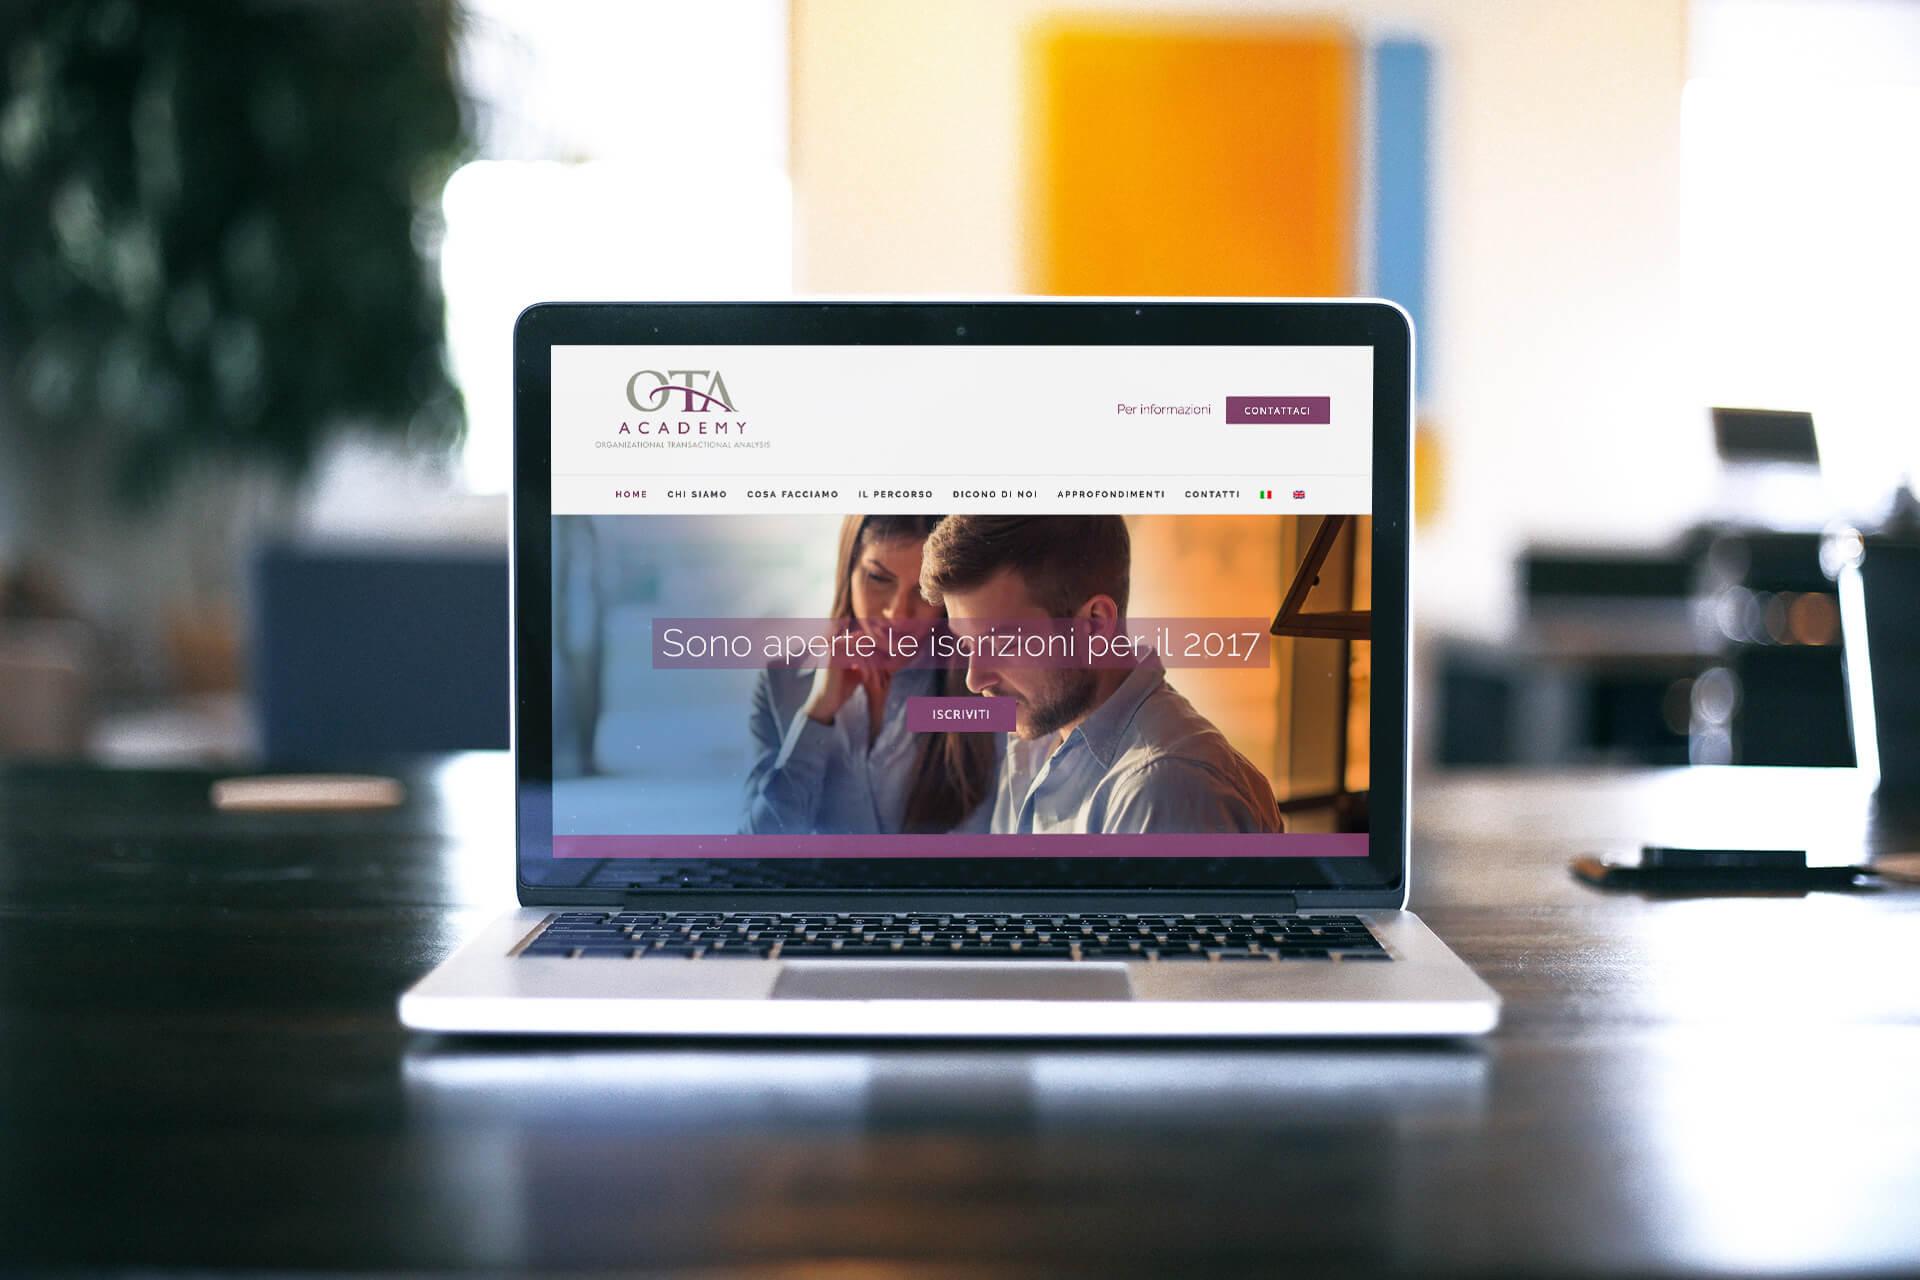 Ota Academy website